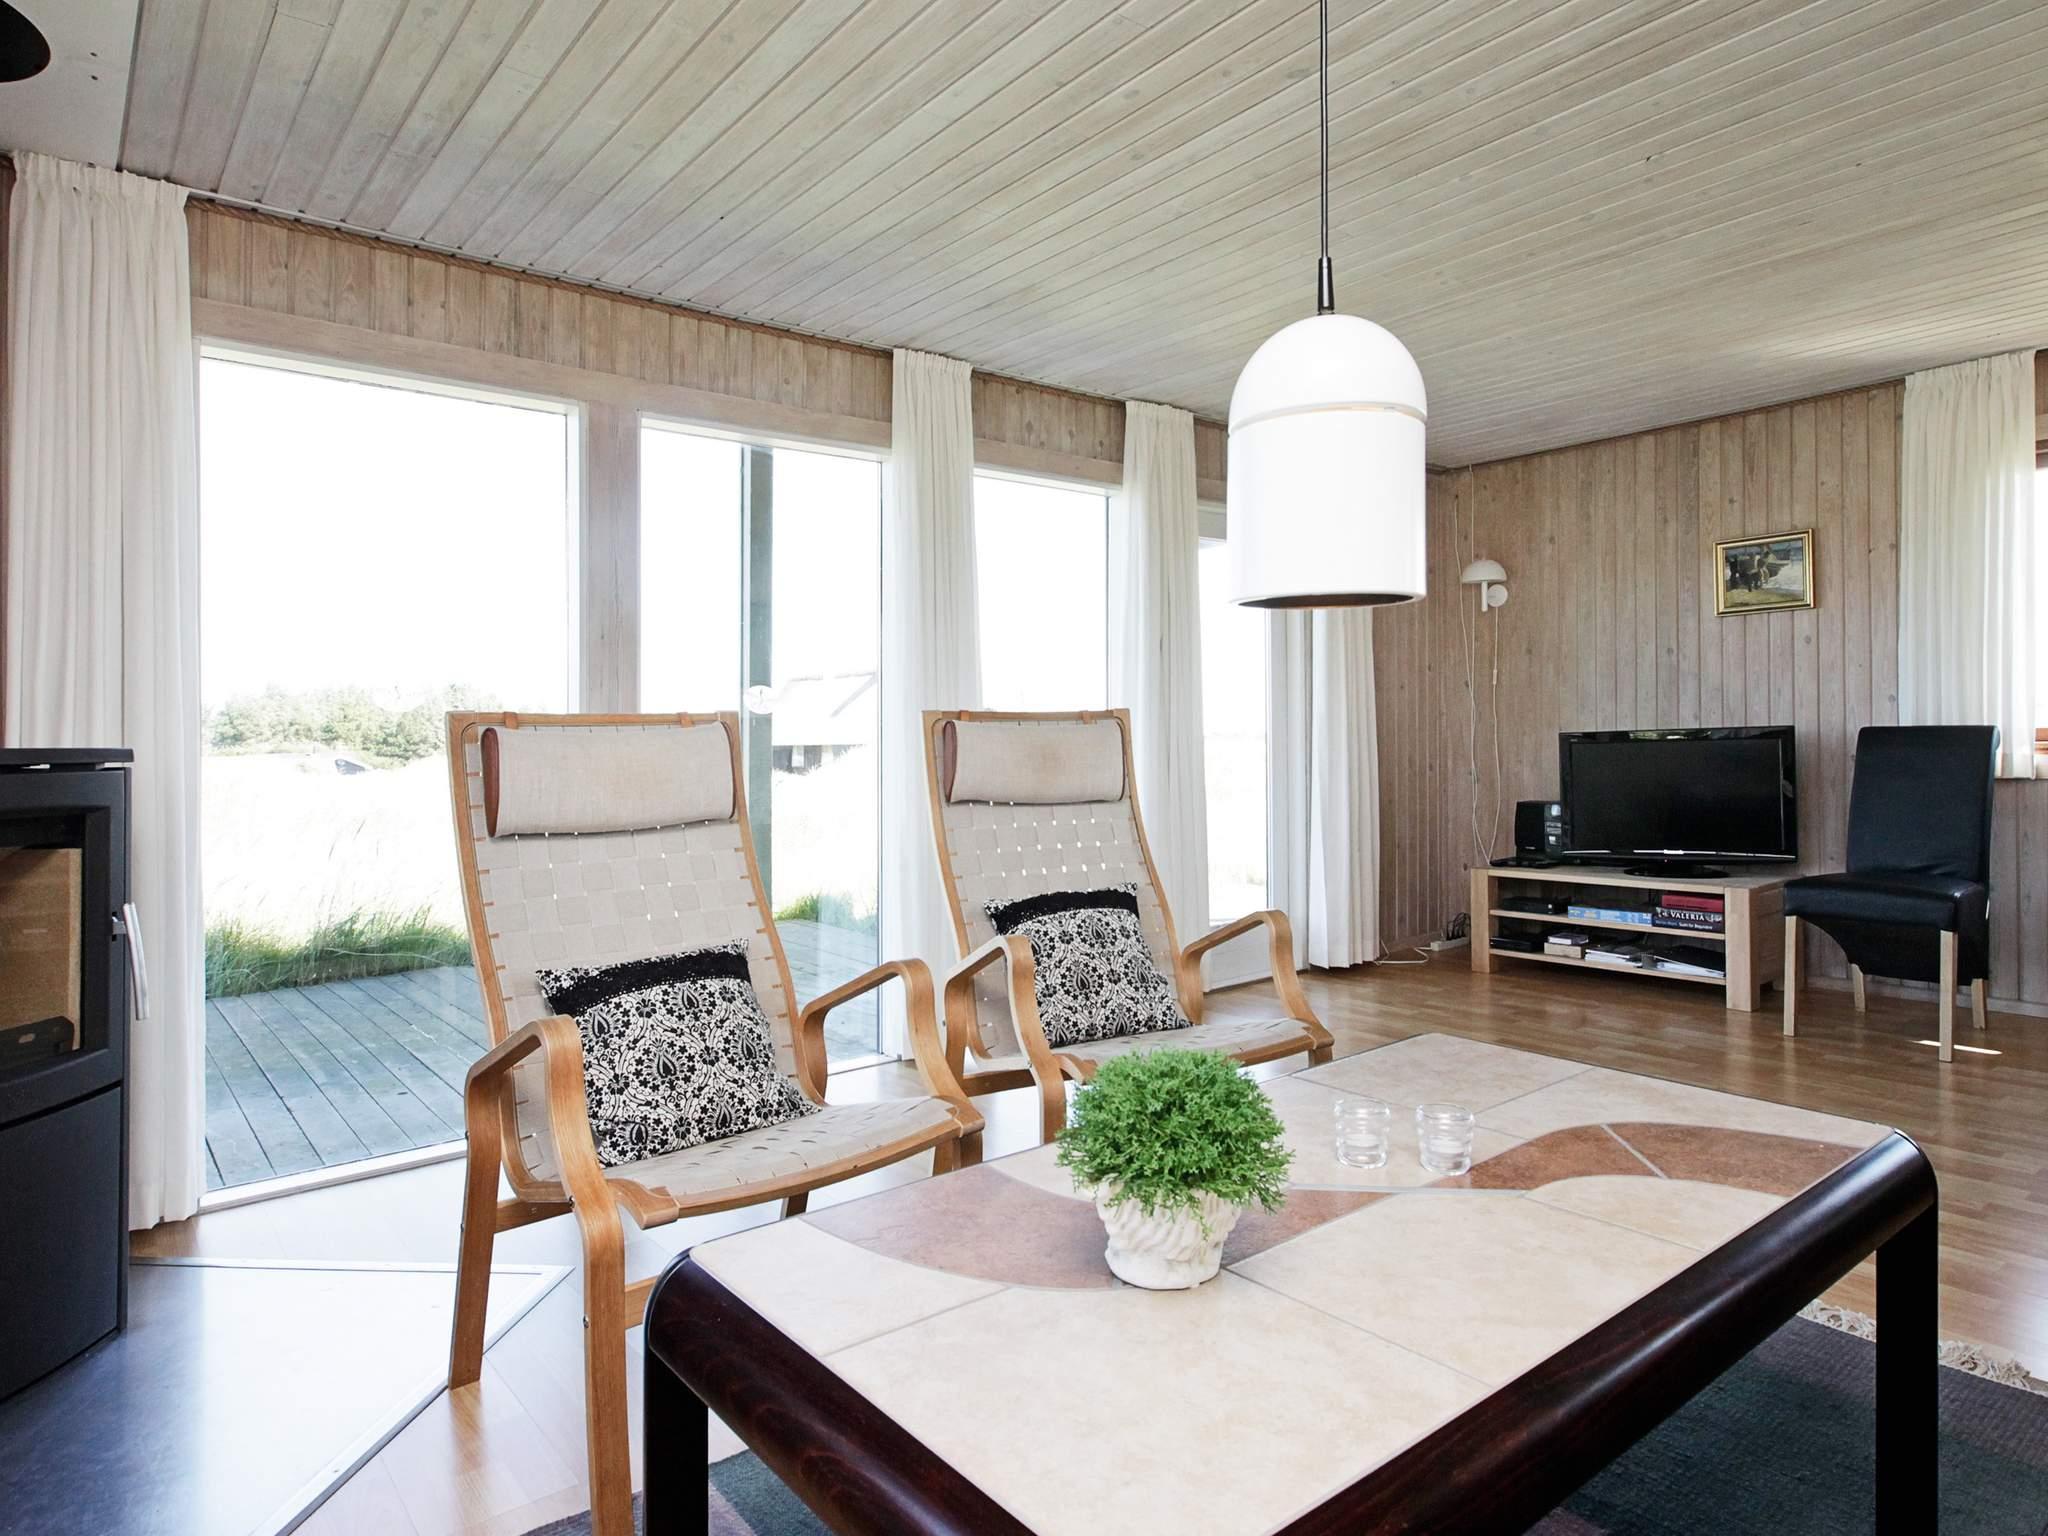 Ferienhaus Grønhøj Strand (83808), Løkken, , Nordwestjütland, Dänemark, Bild 5